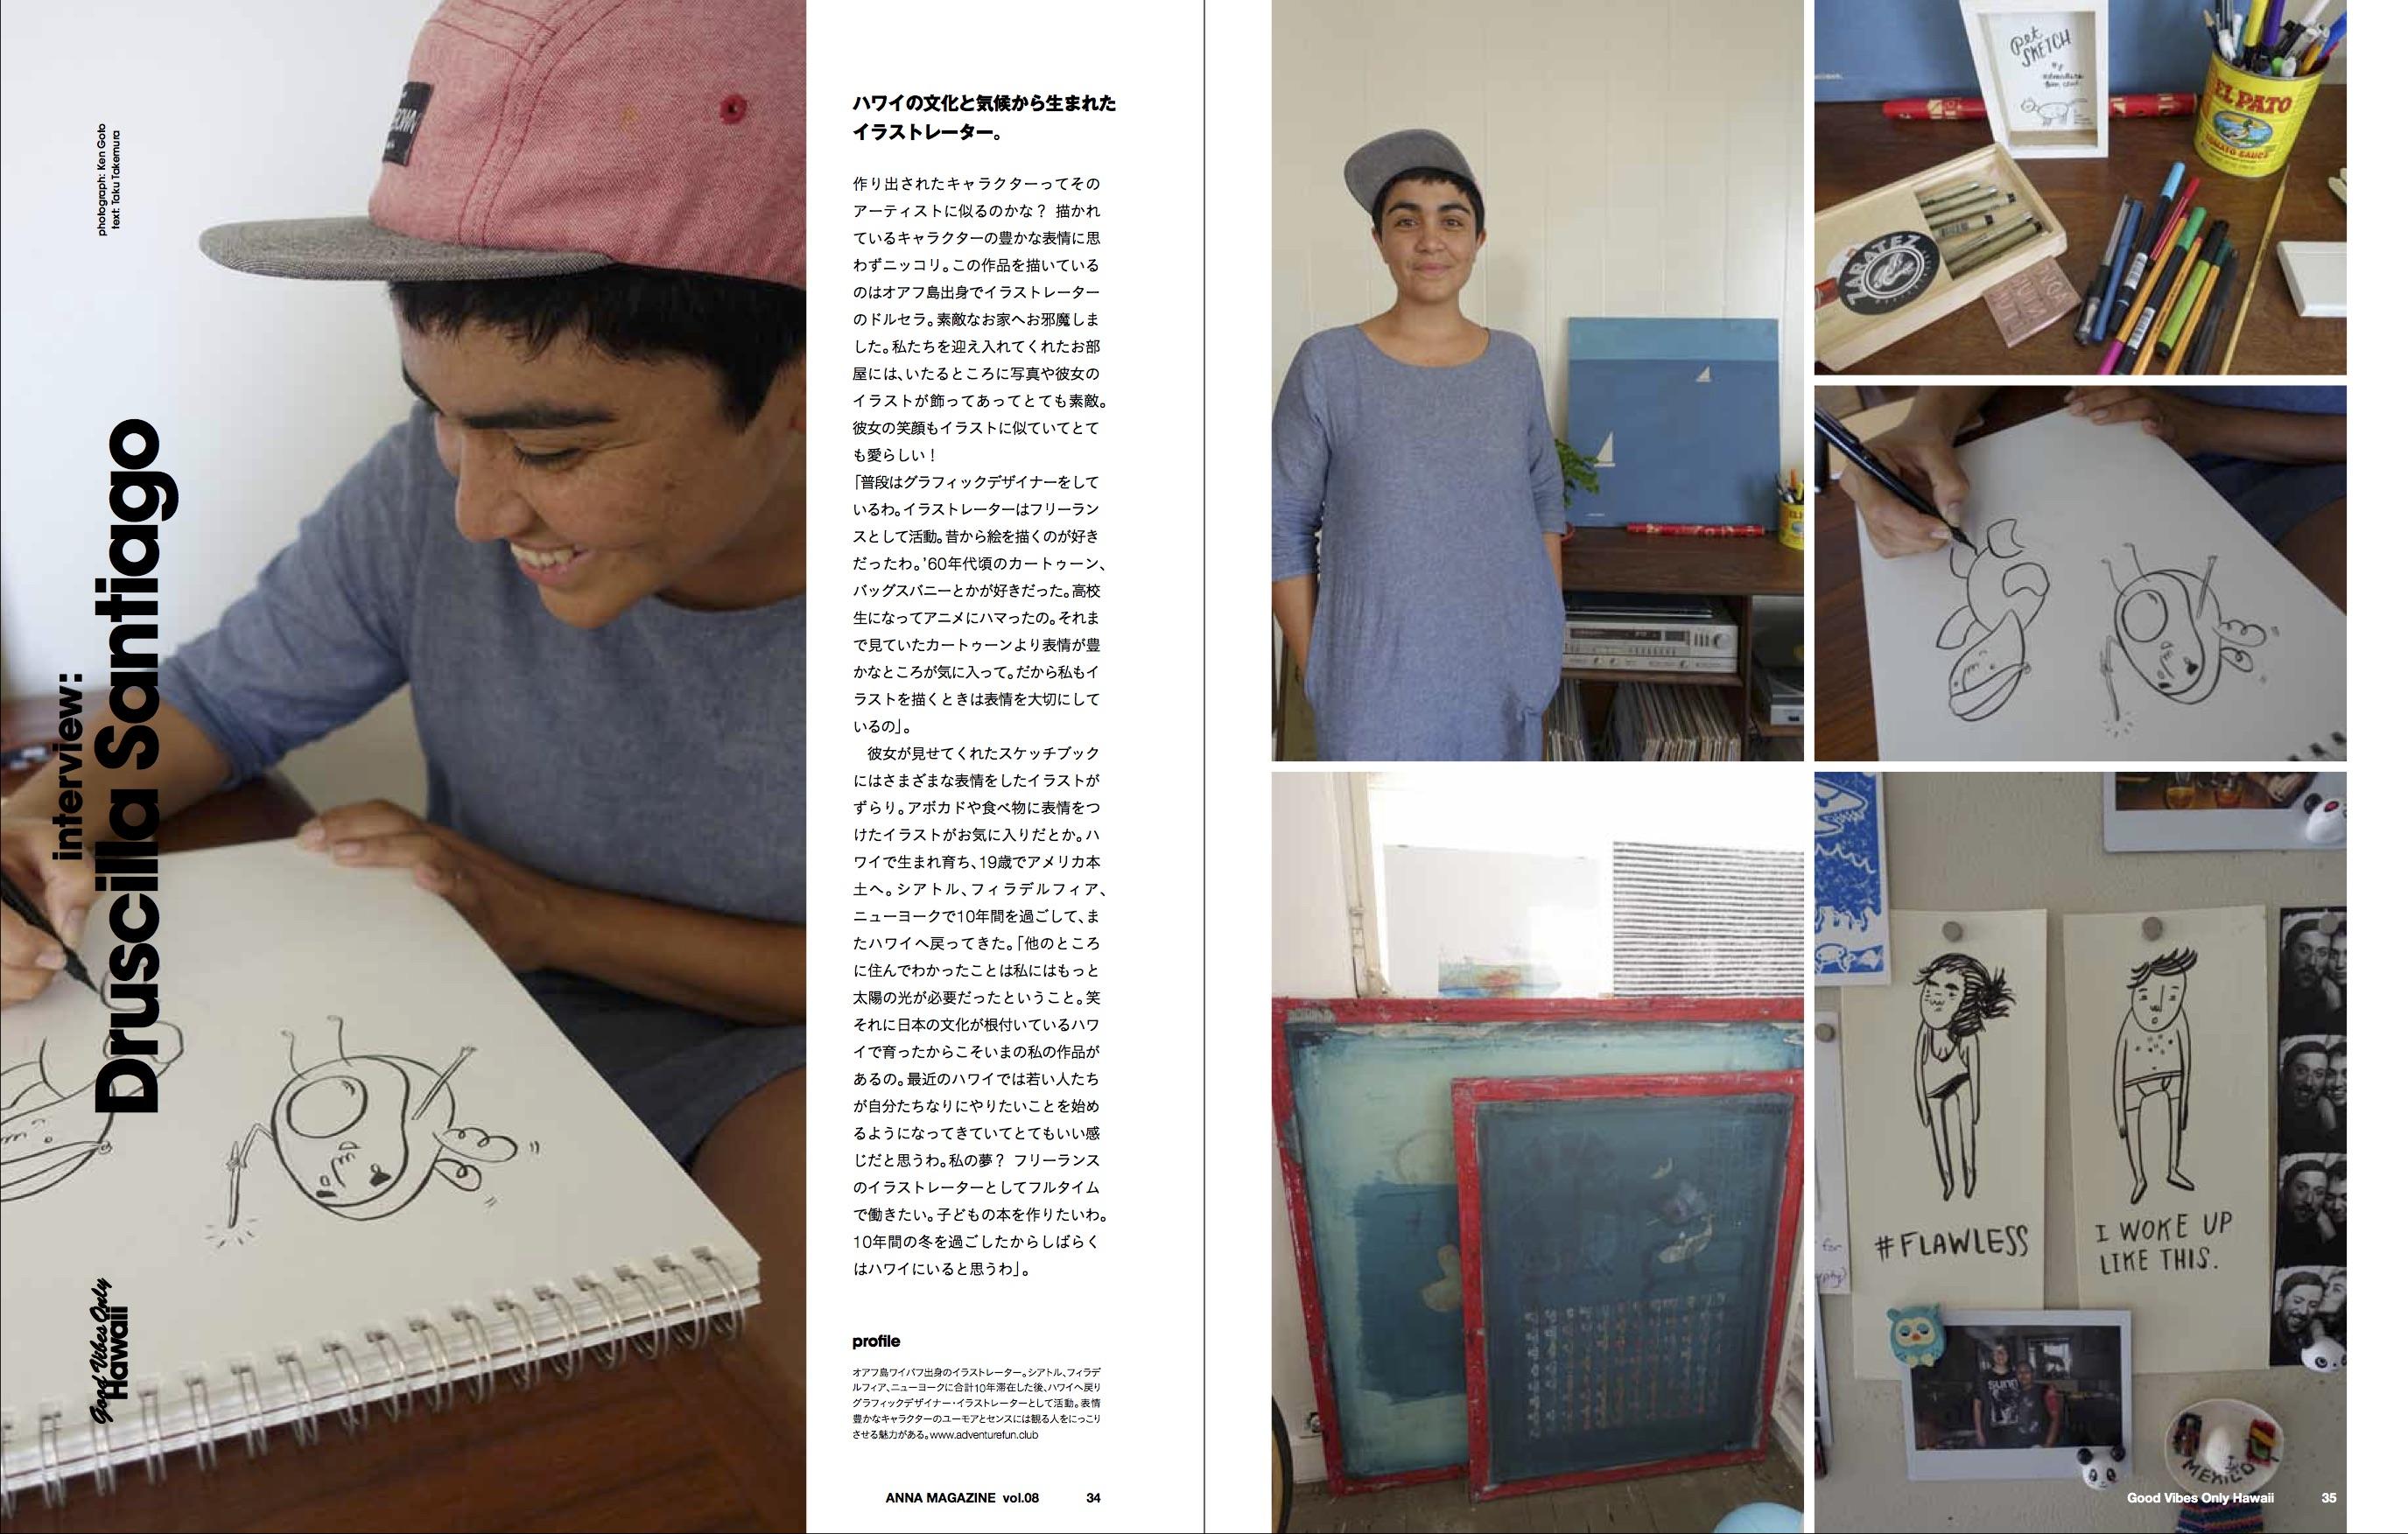 anna magazine vol.8 P16